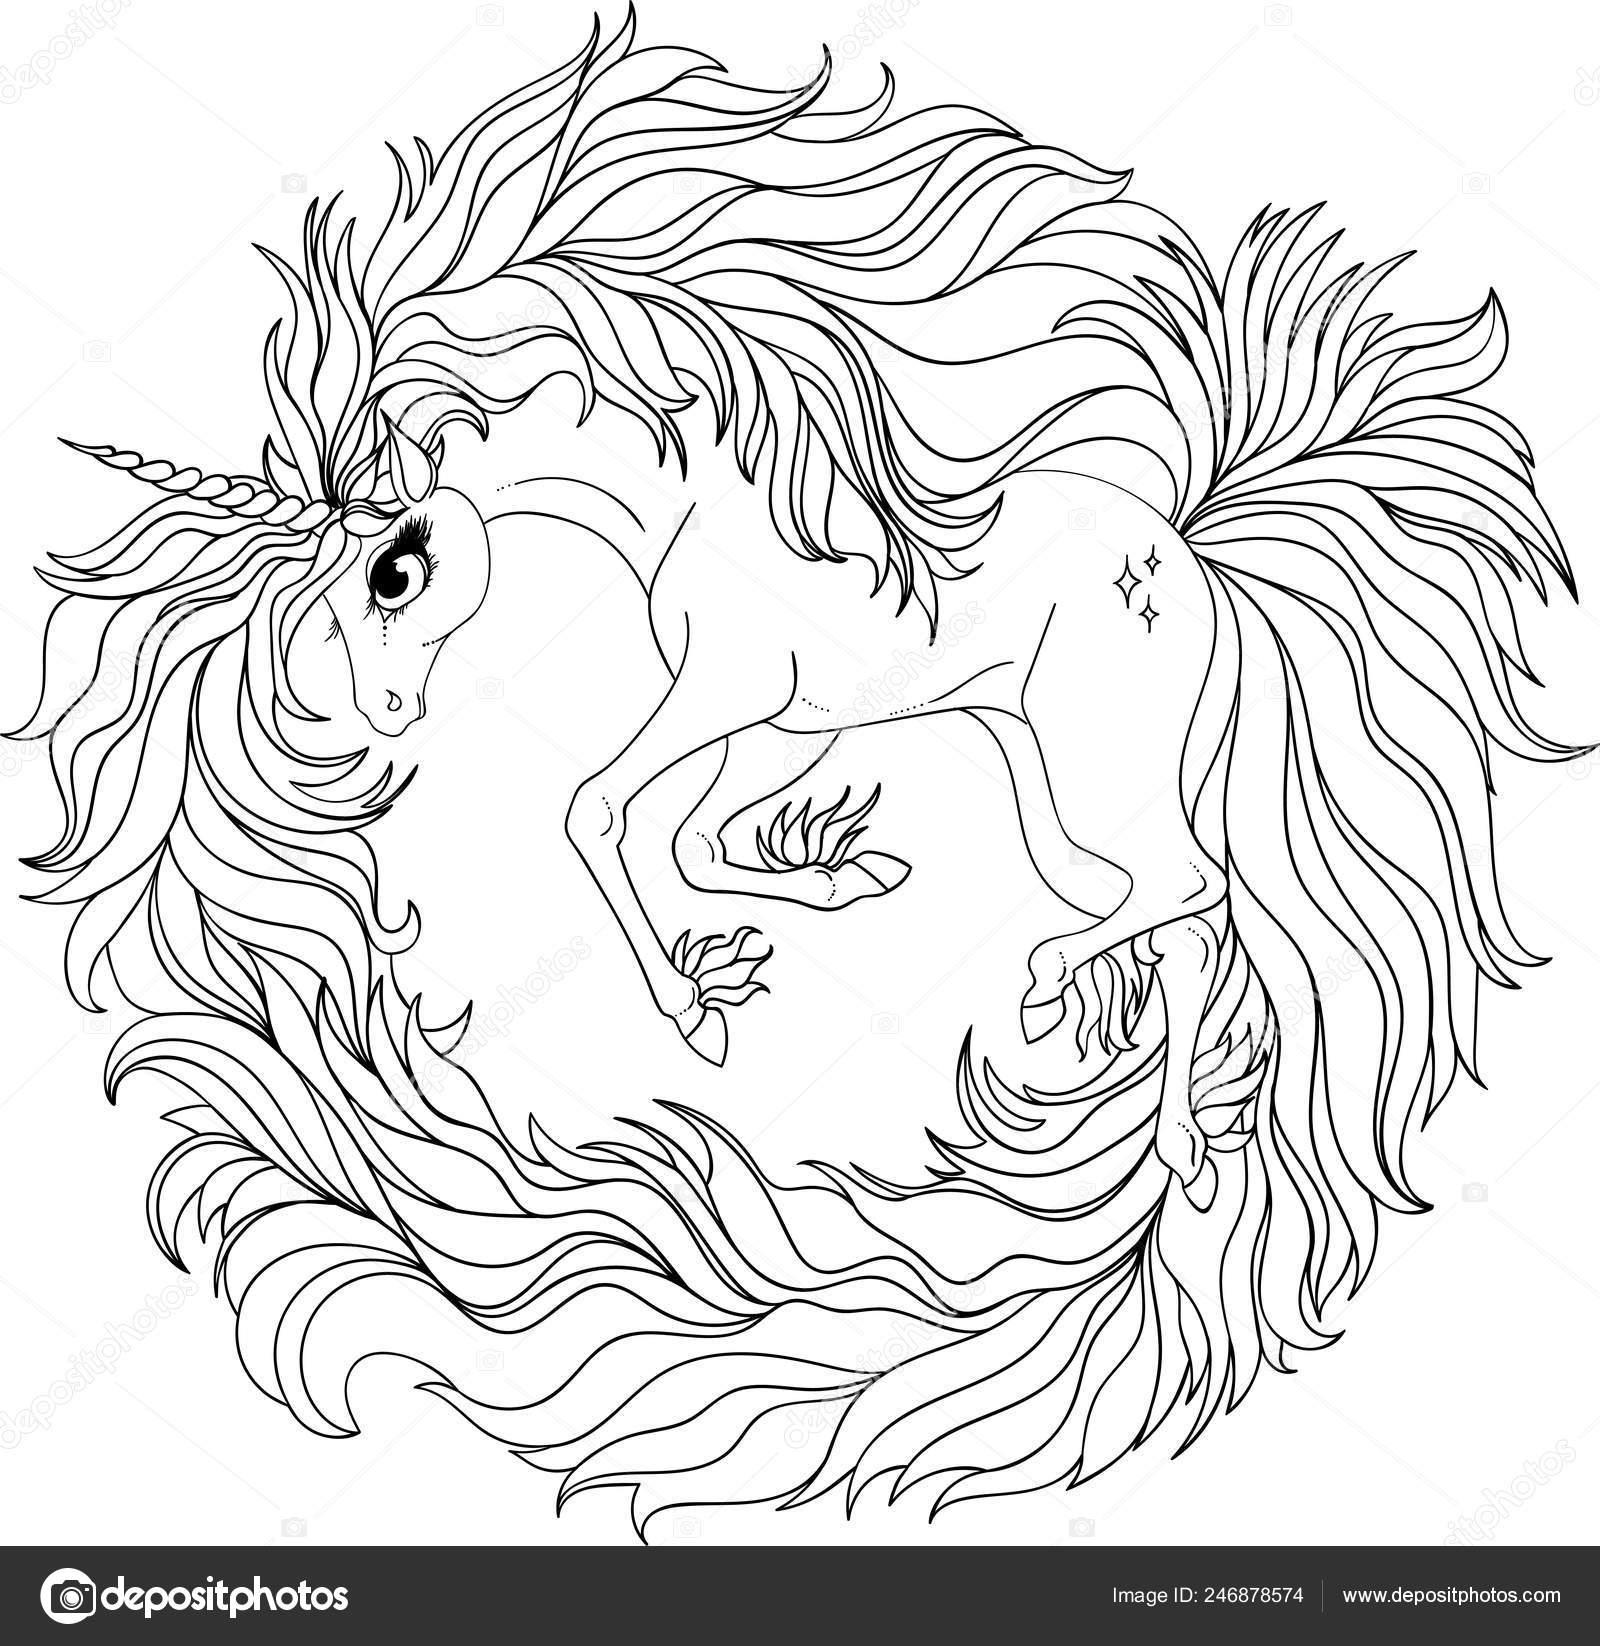 Drawing Unicorn Zentangle Style Coloring Book Tattoo Shirt Design